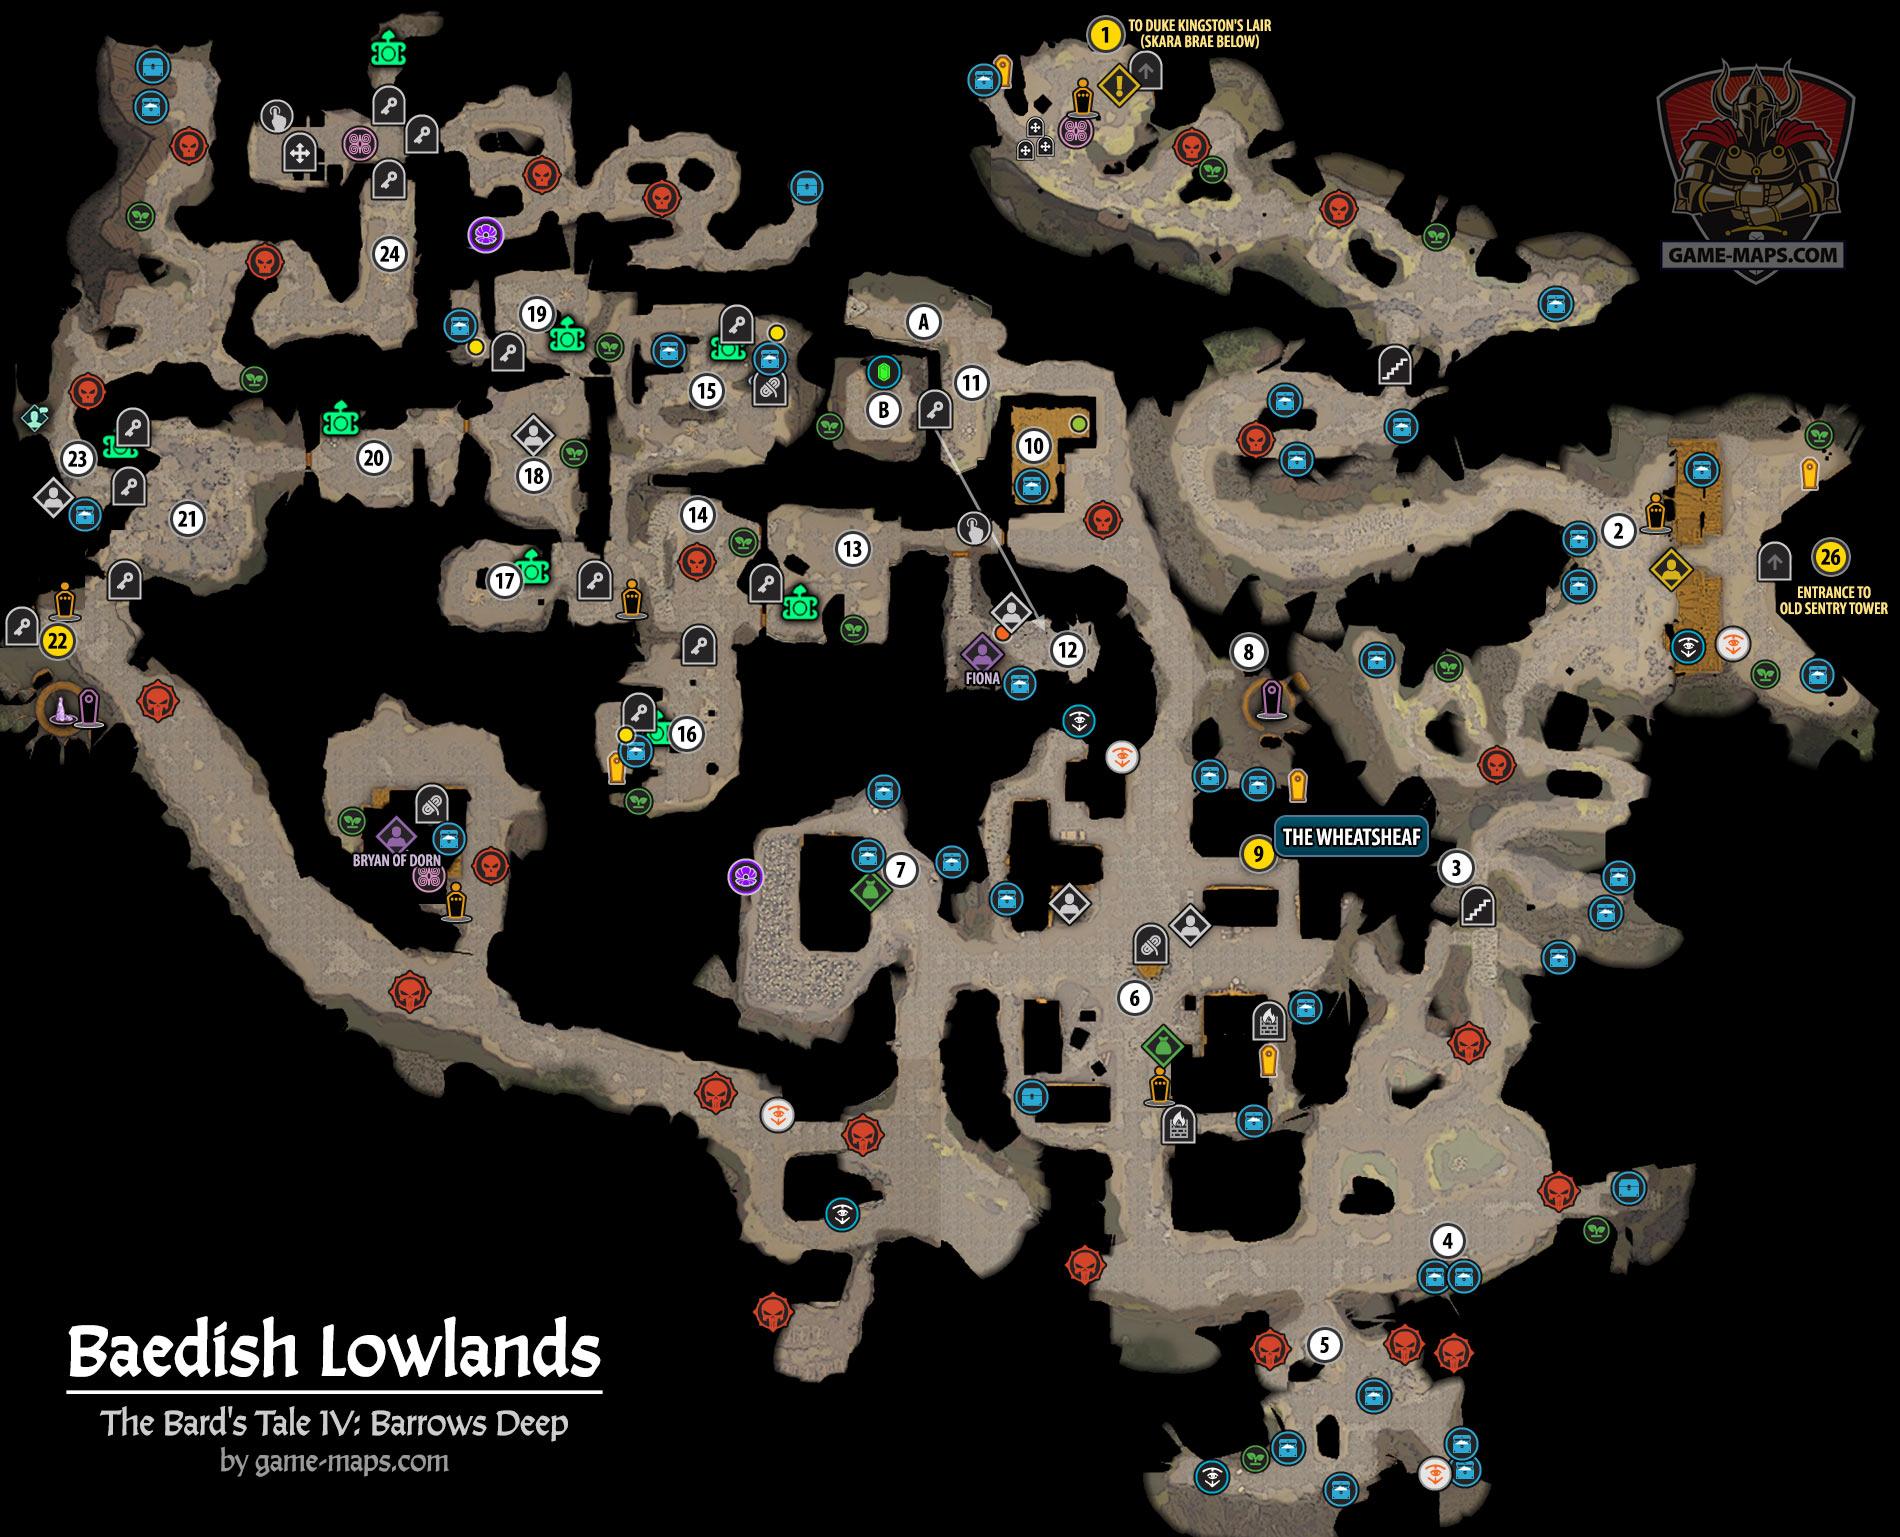 Baedish Lowlands Map Game Maps Com